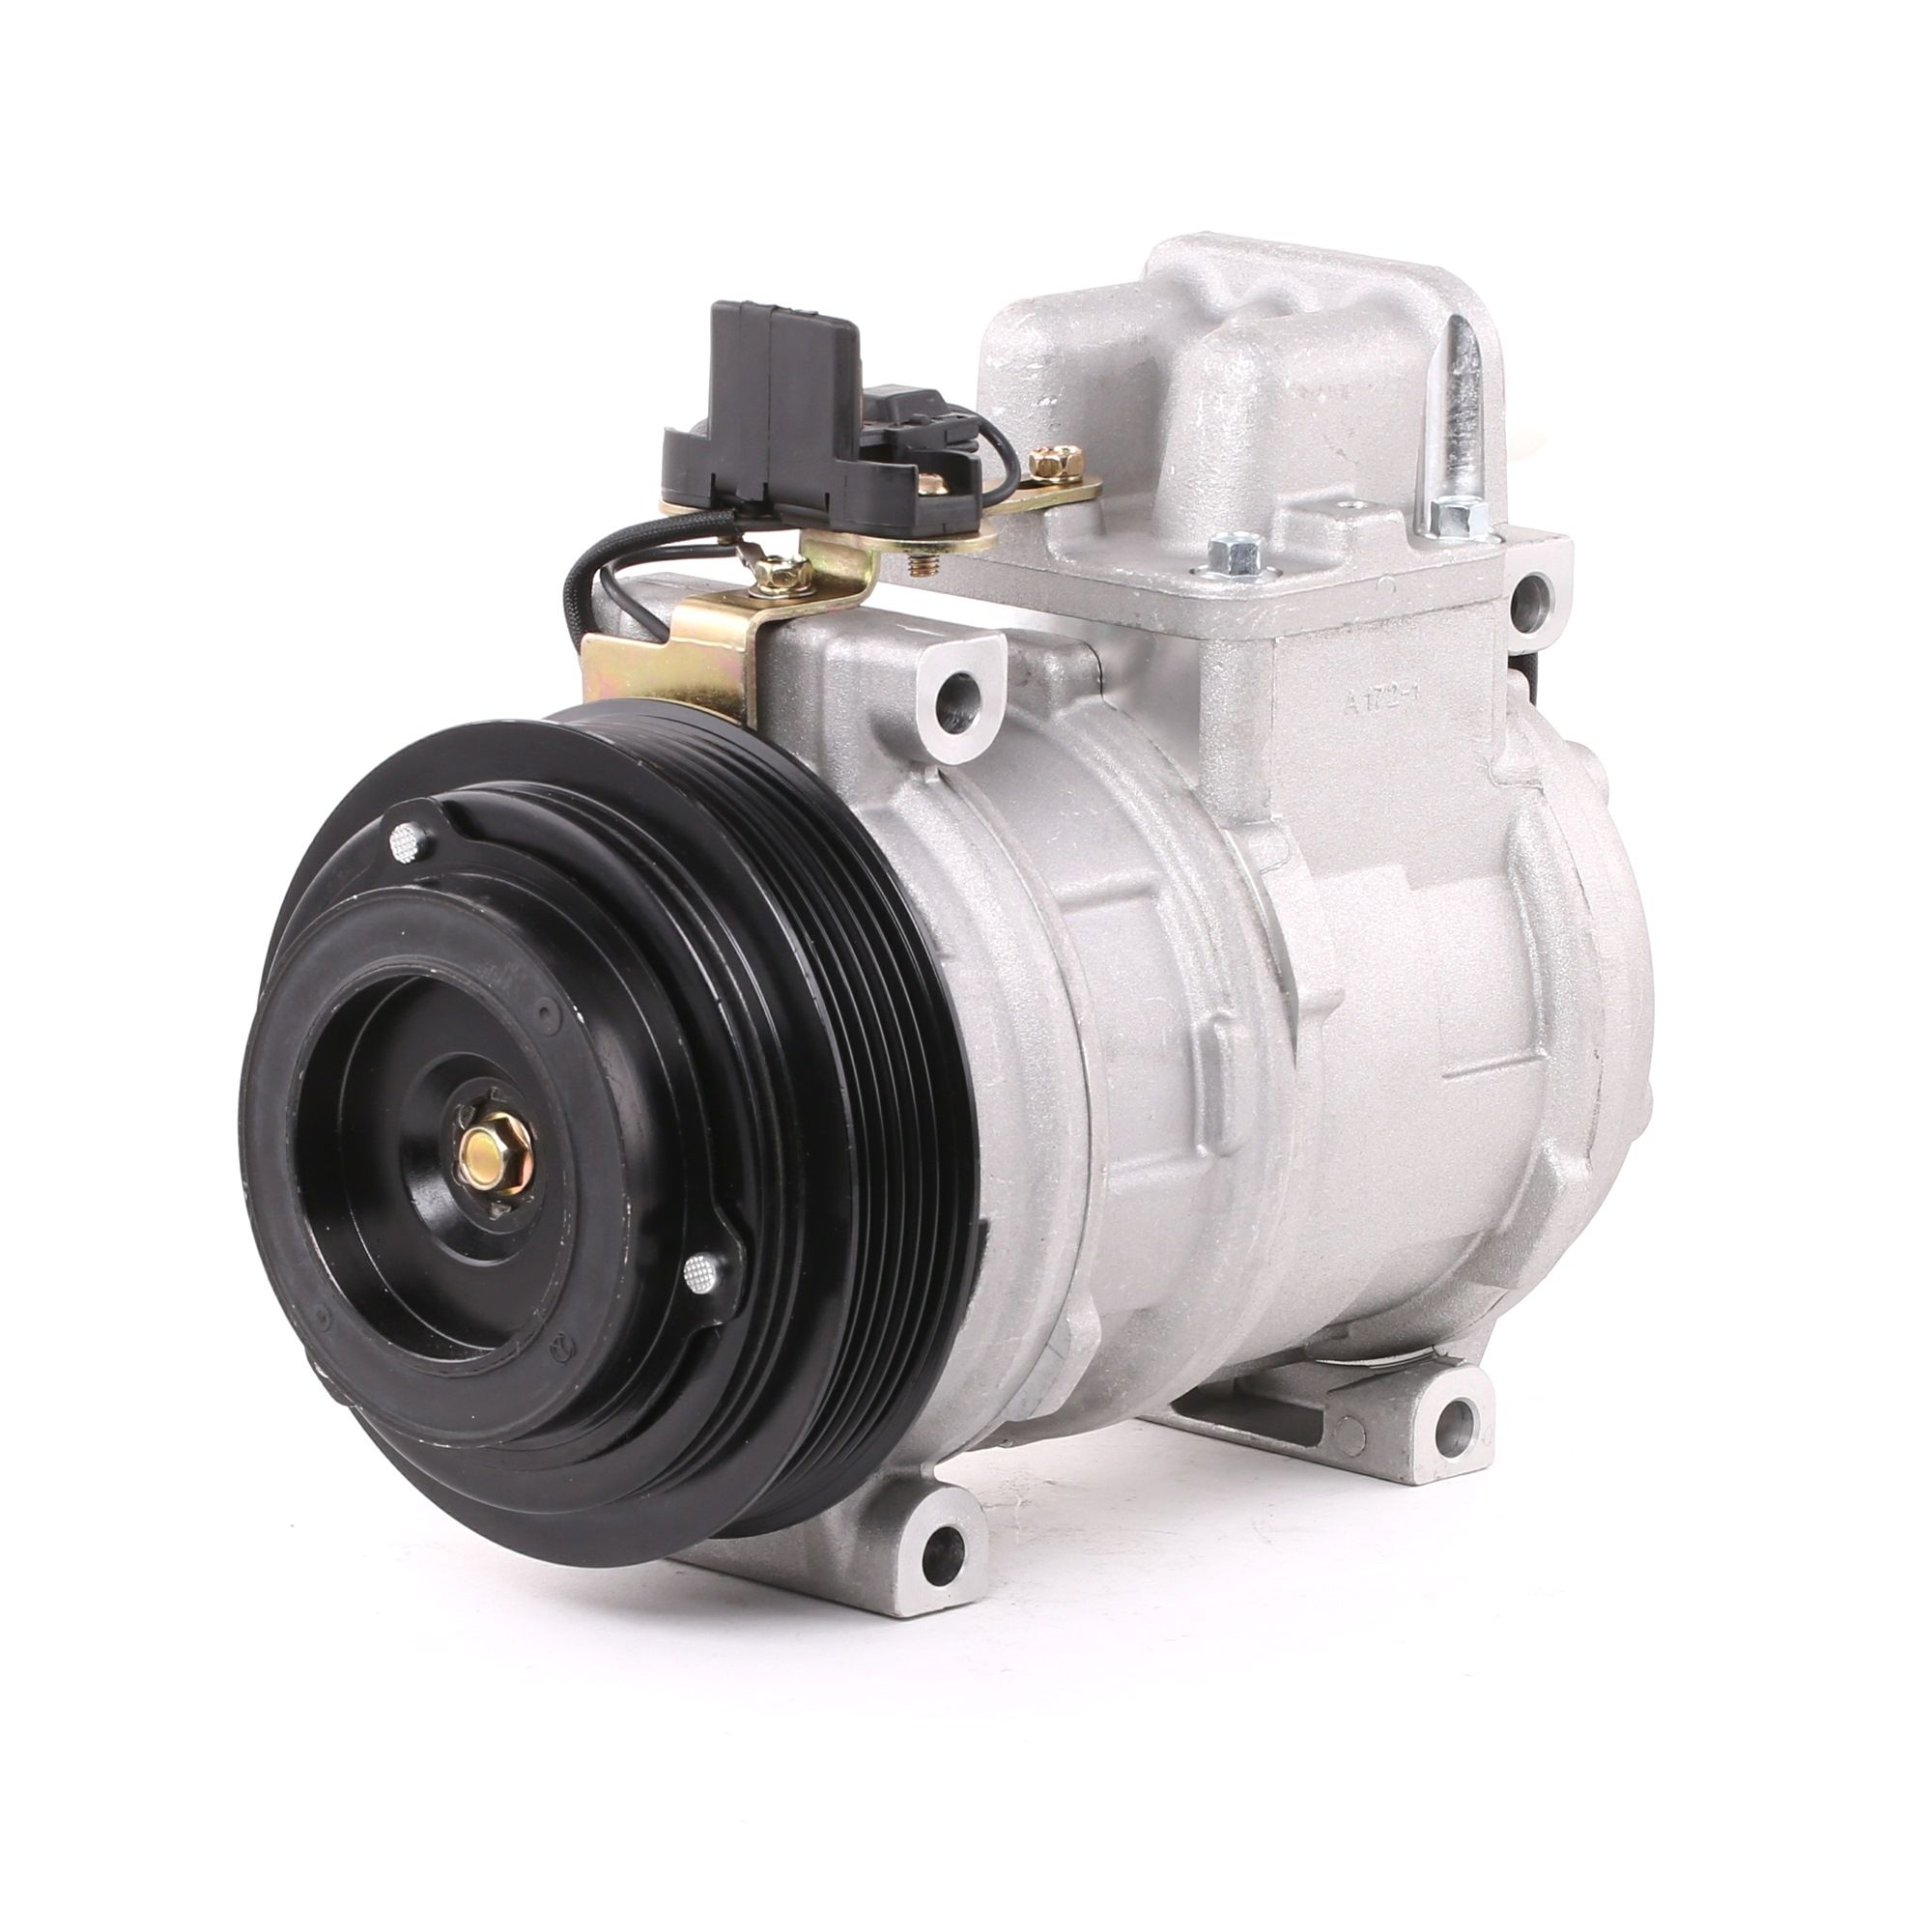 Original MERCEDES-BENZ Kompressor Klimaanlage 447K0111